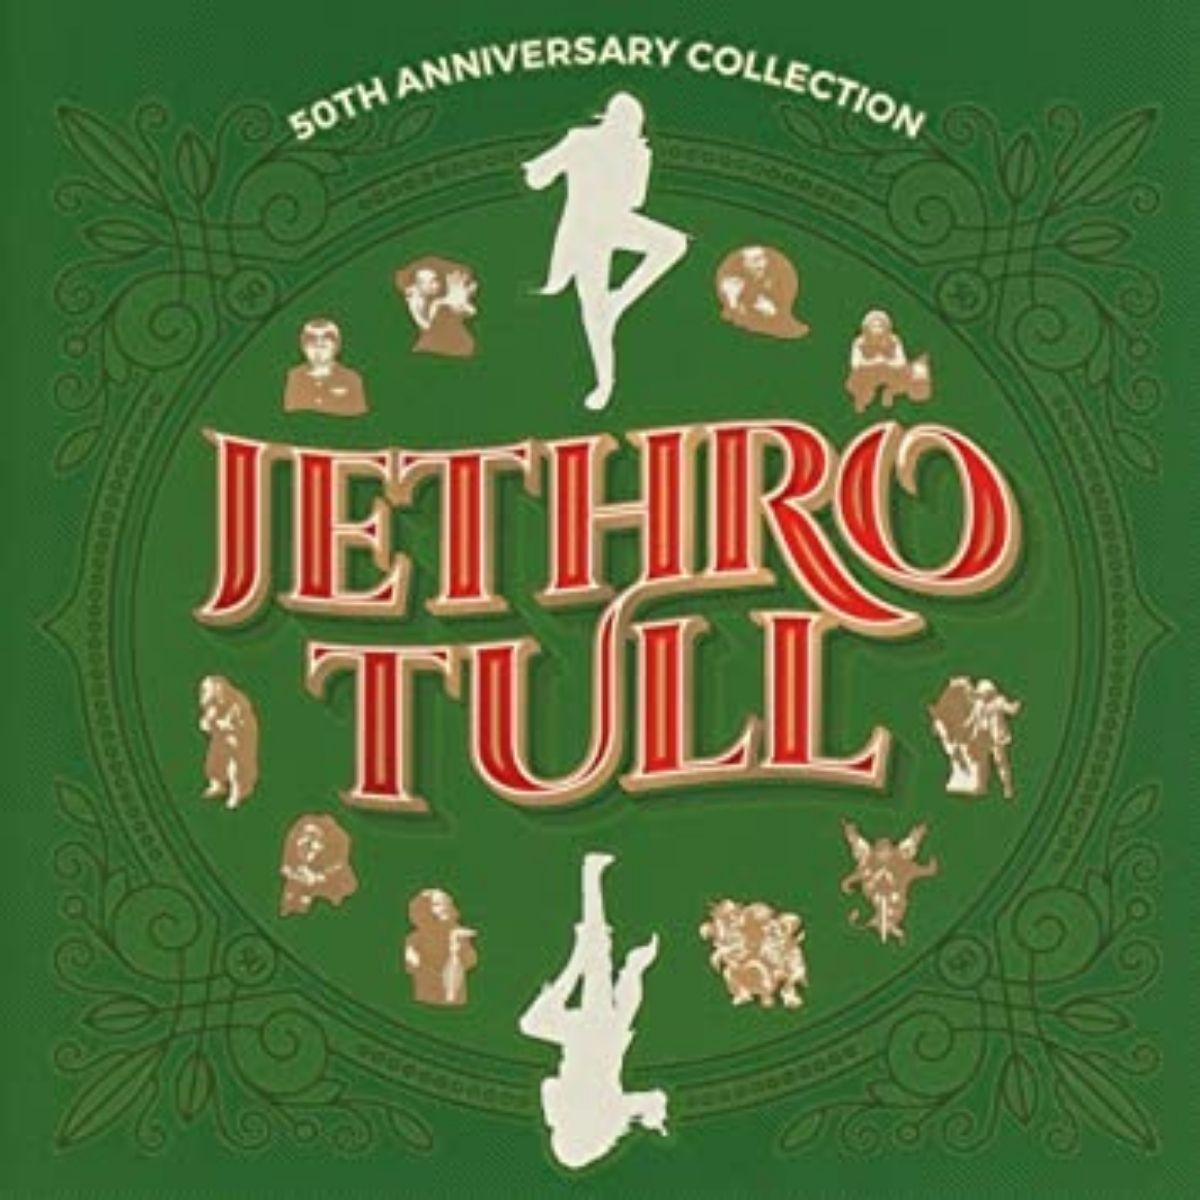 Lp Jethro Tull 50th Anniversary 2018 Lacrado